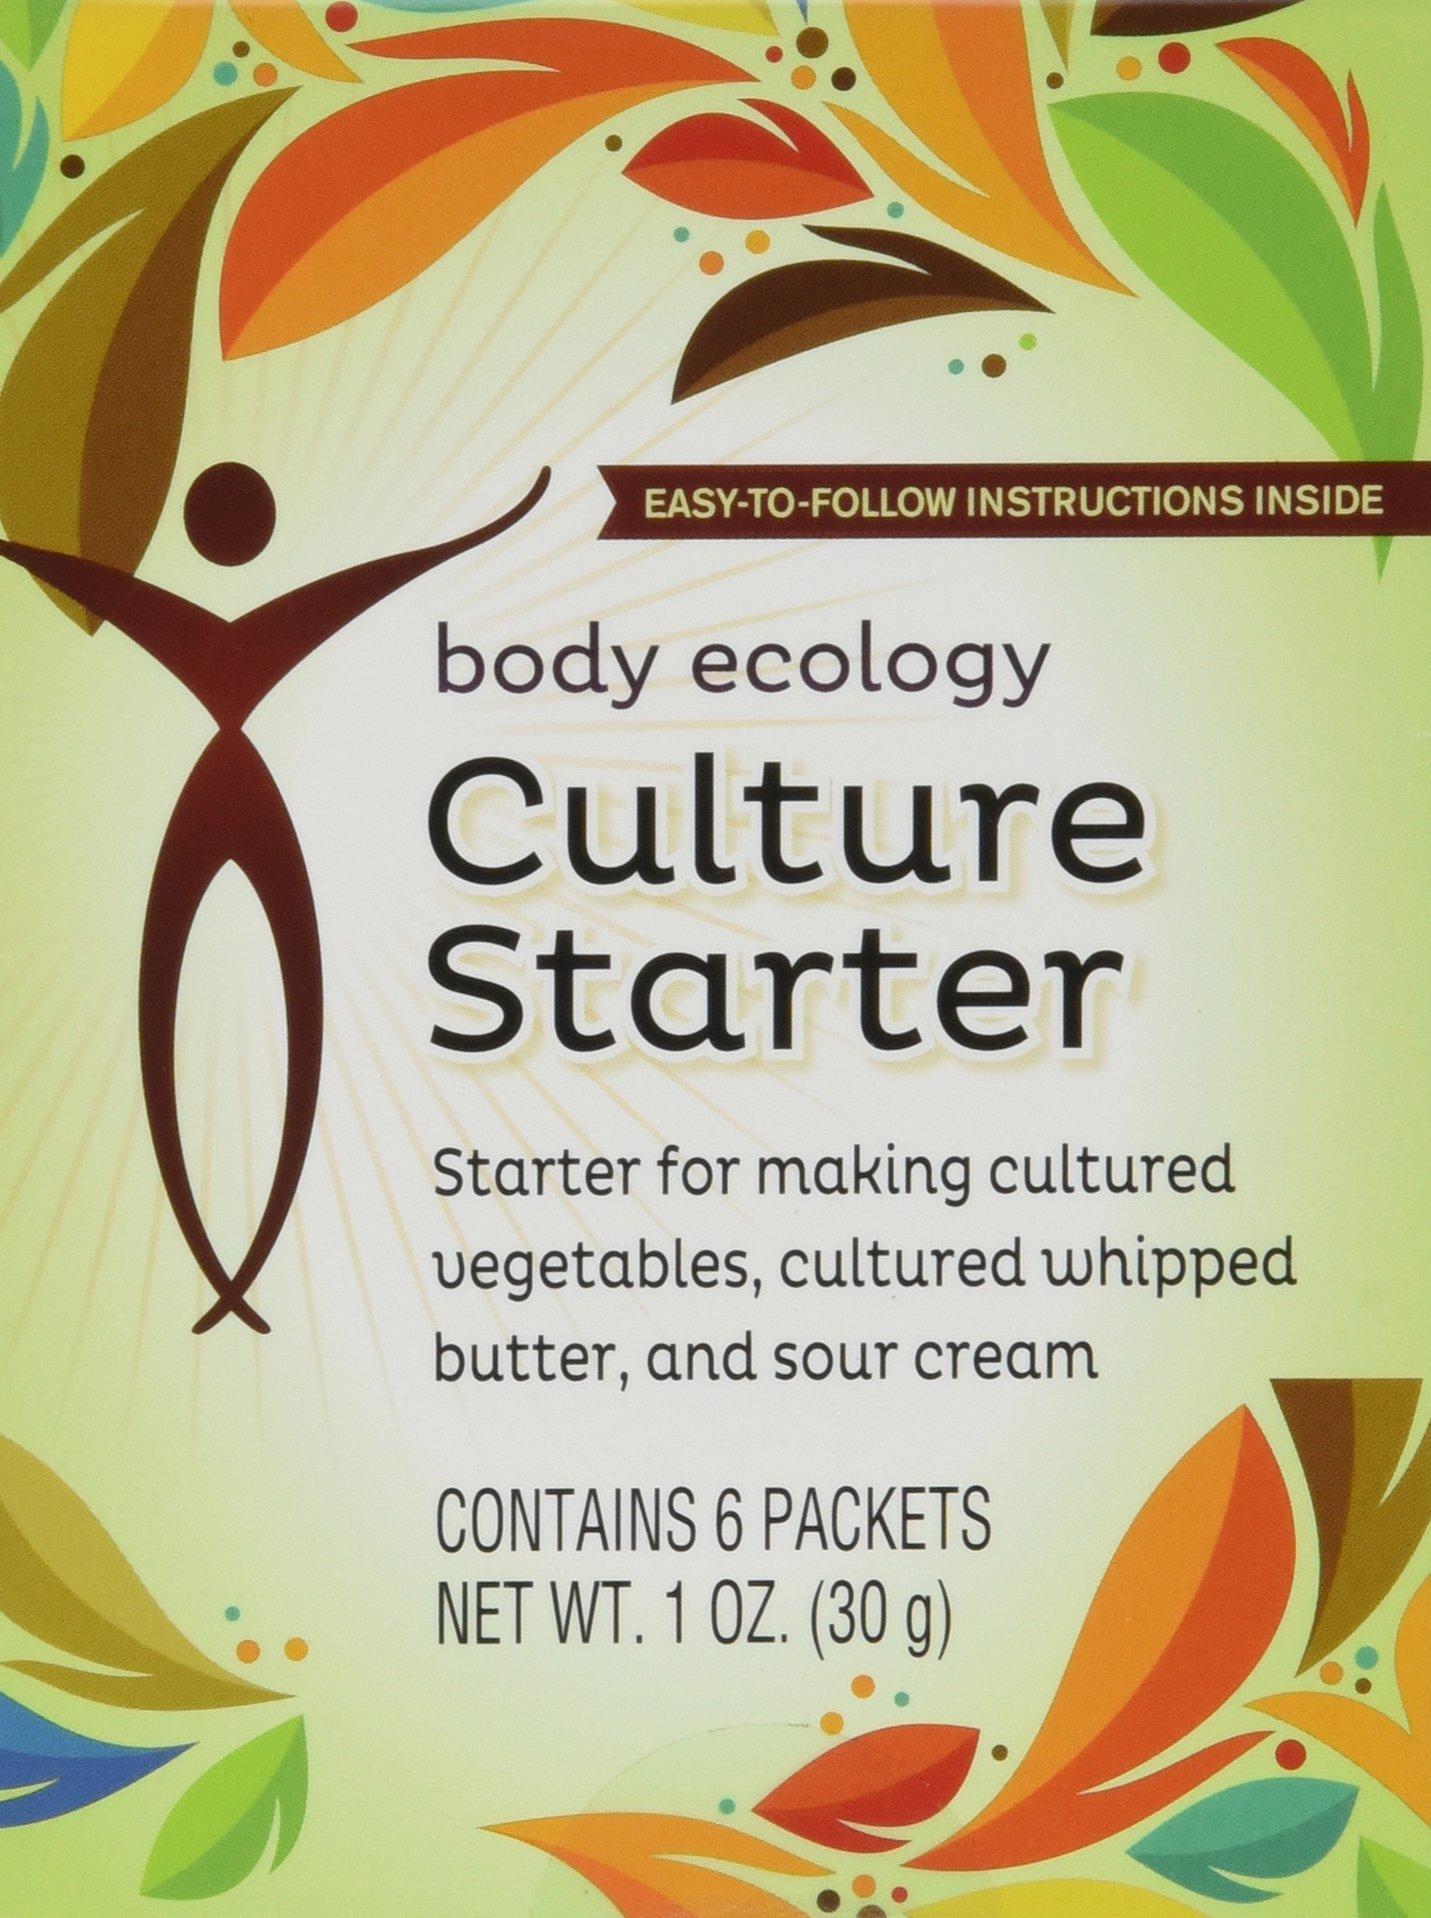 Culture Starter by Body Ecology,1oz.